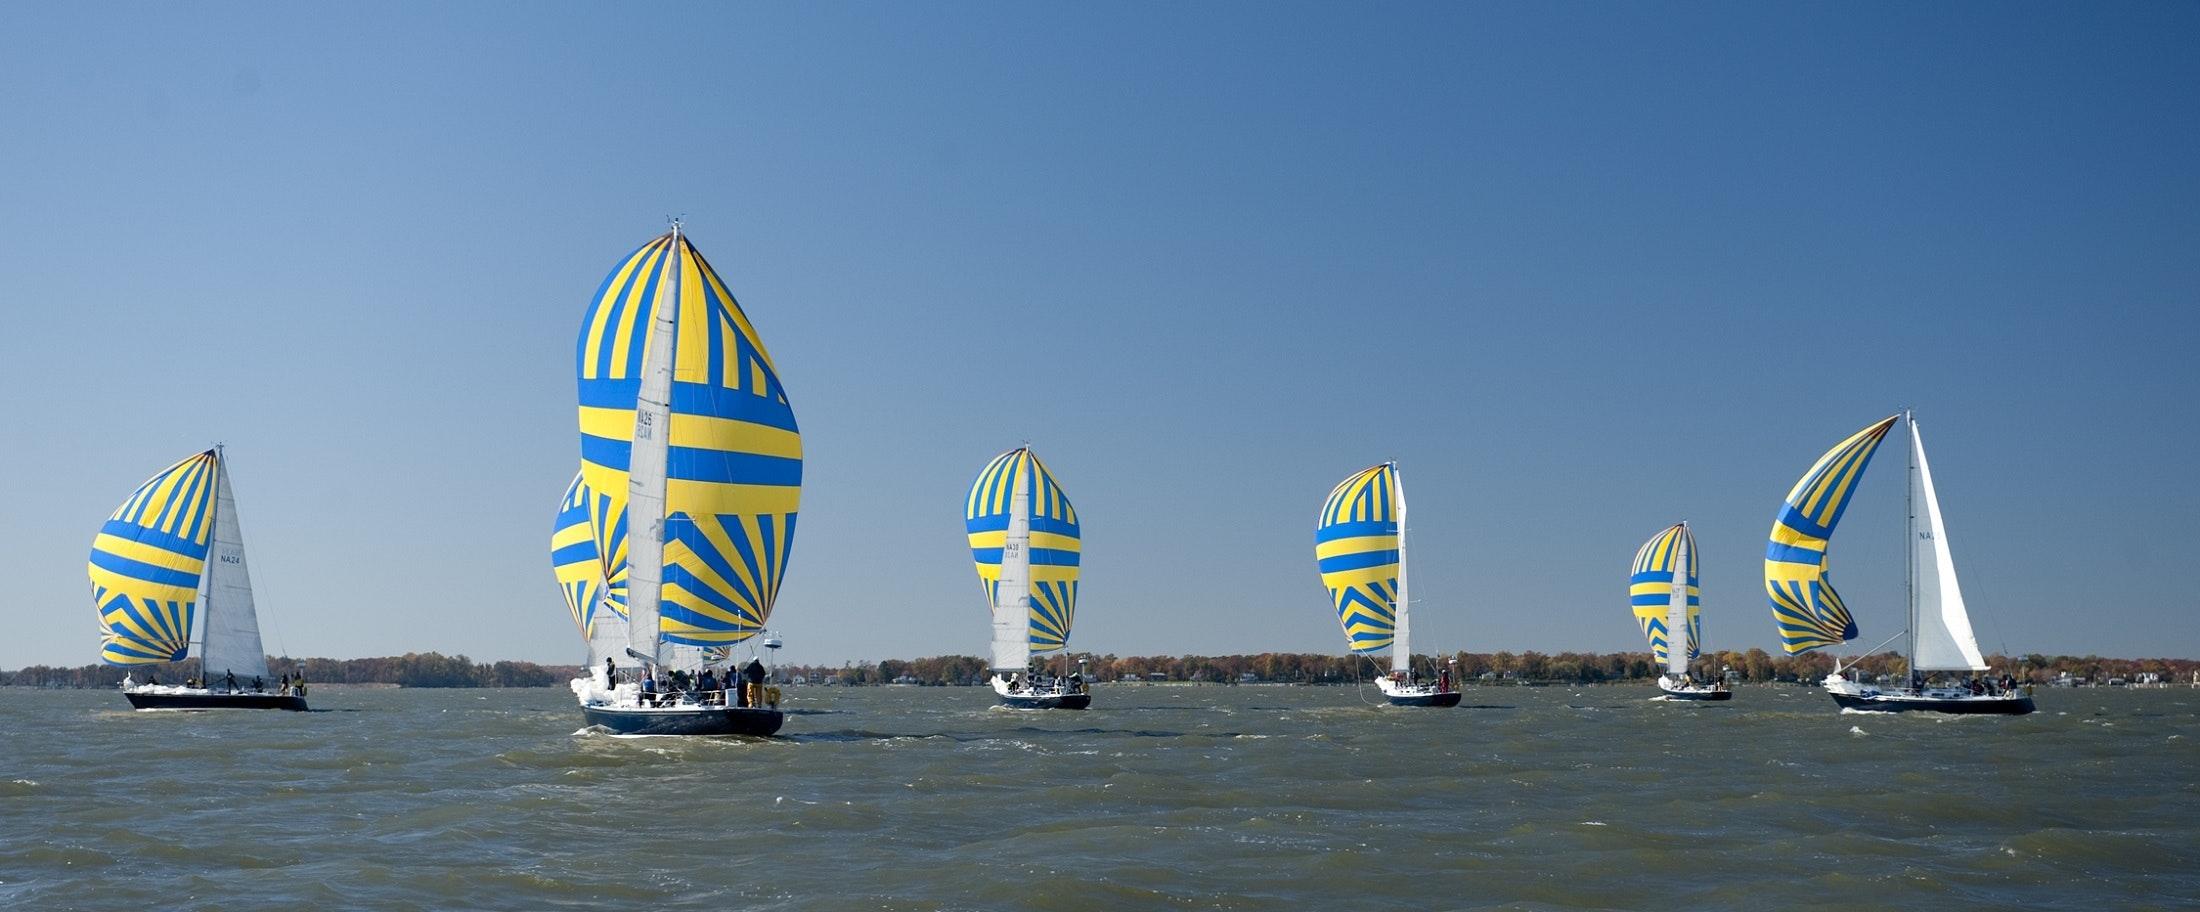 Sailboats racing photo